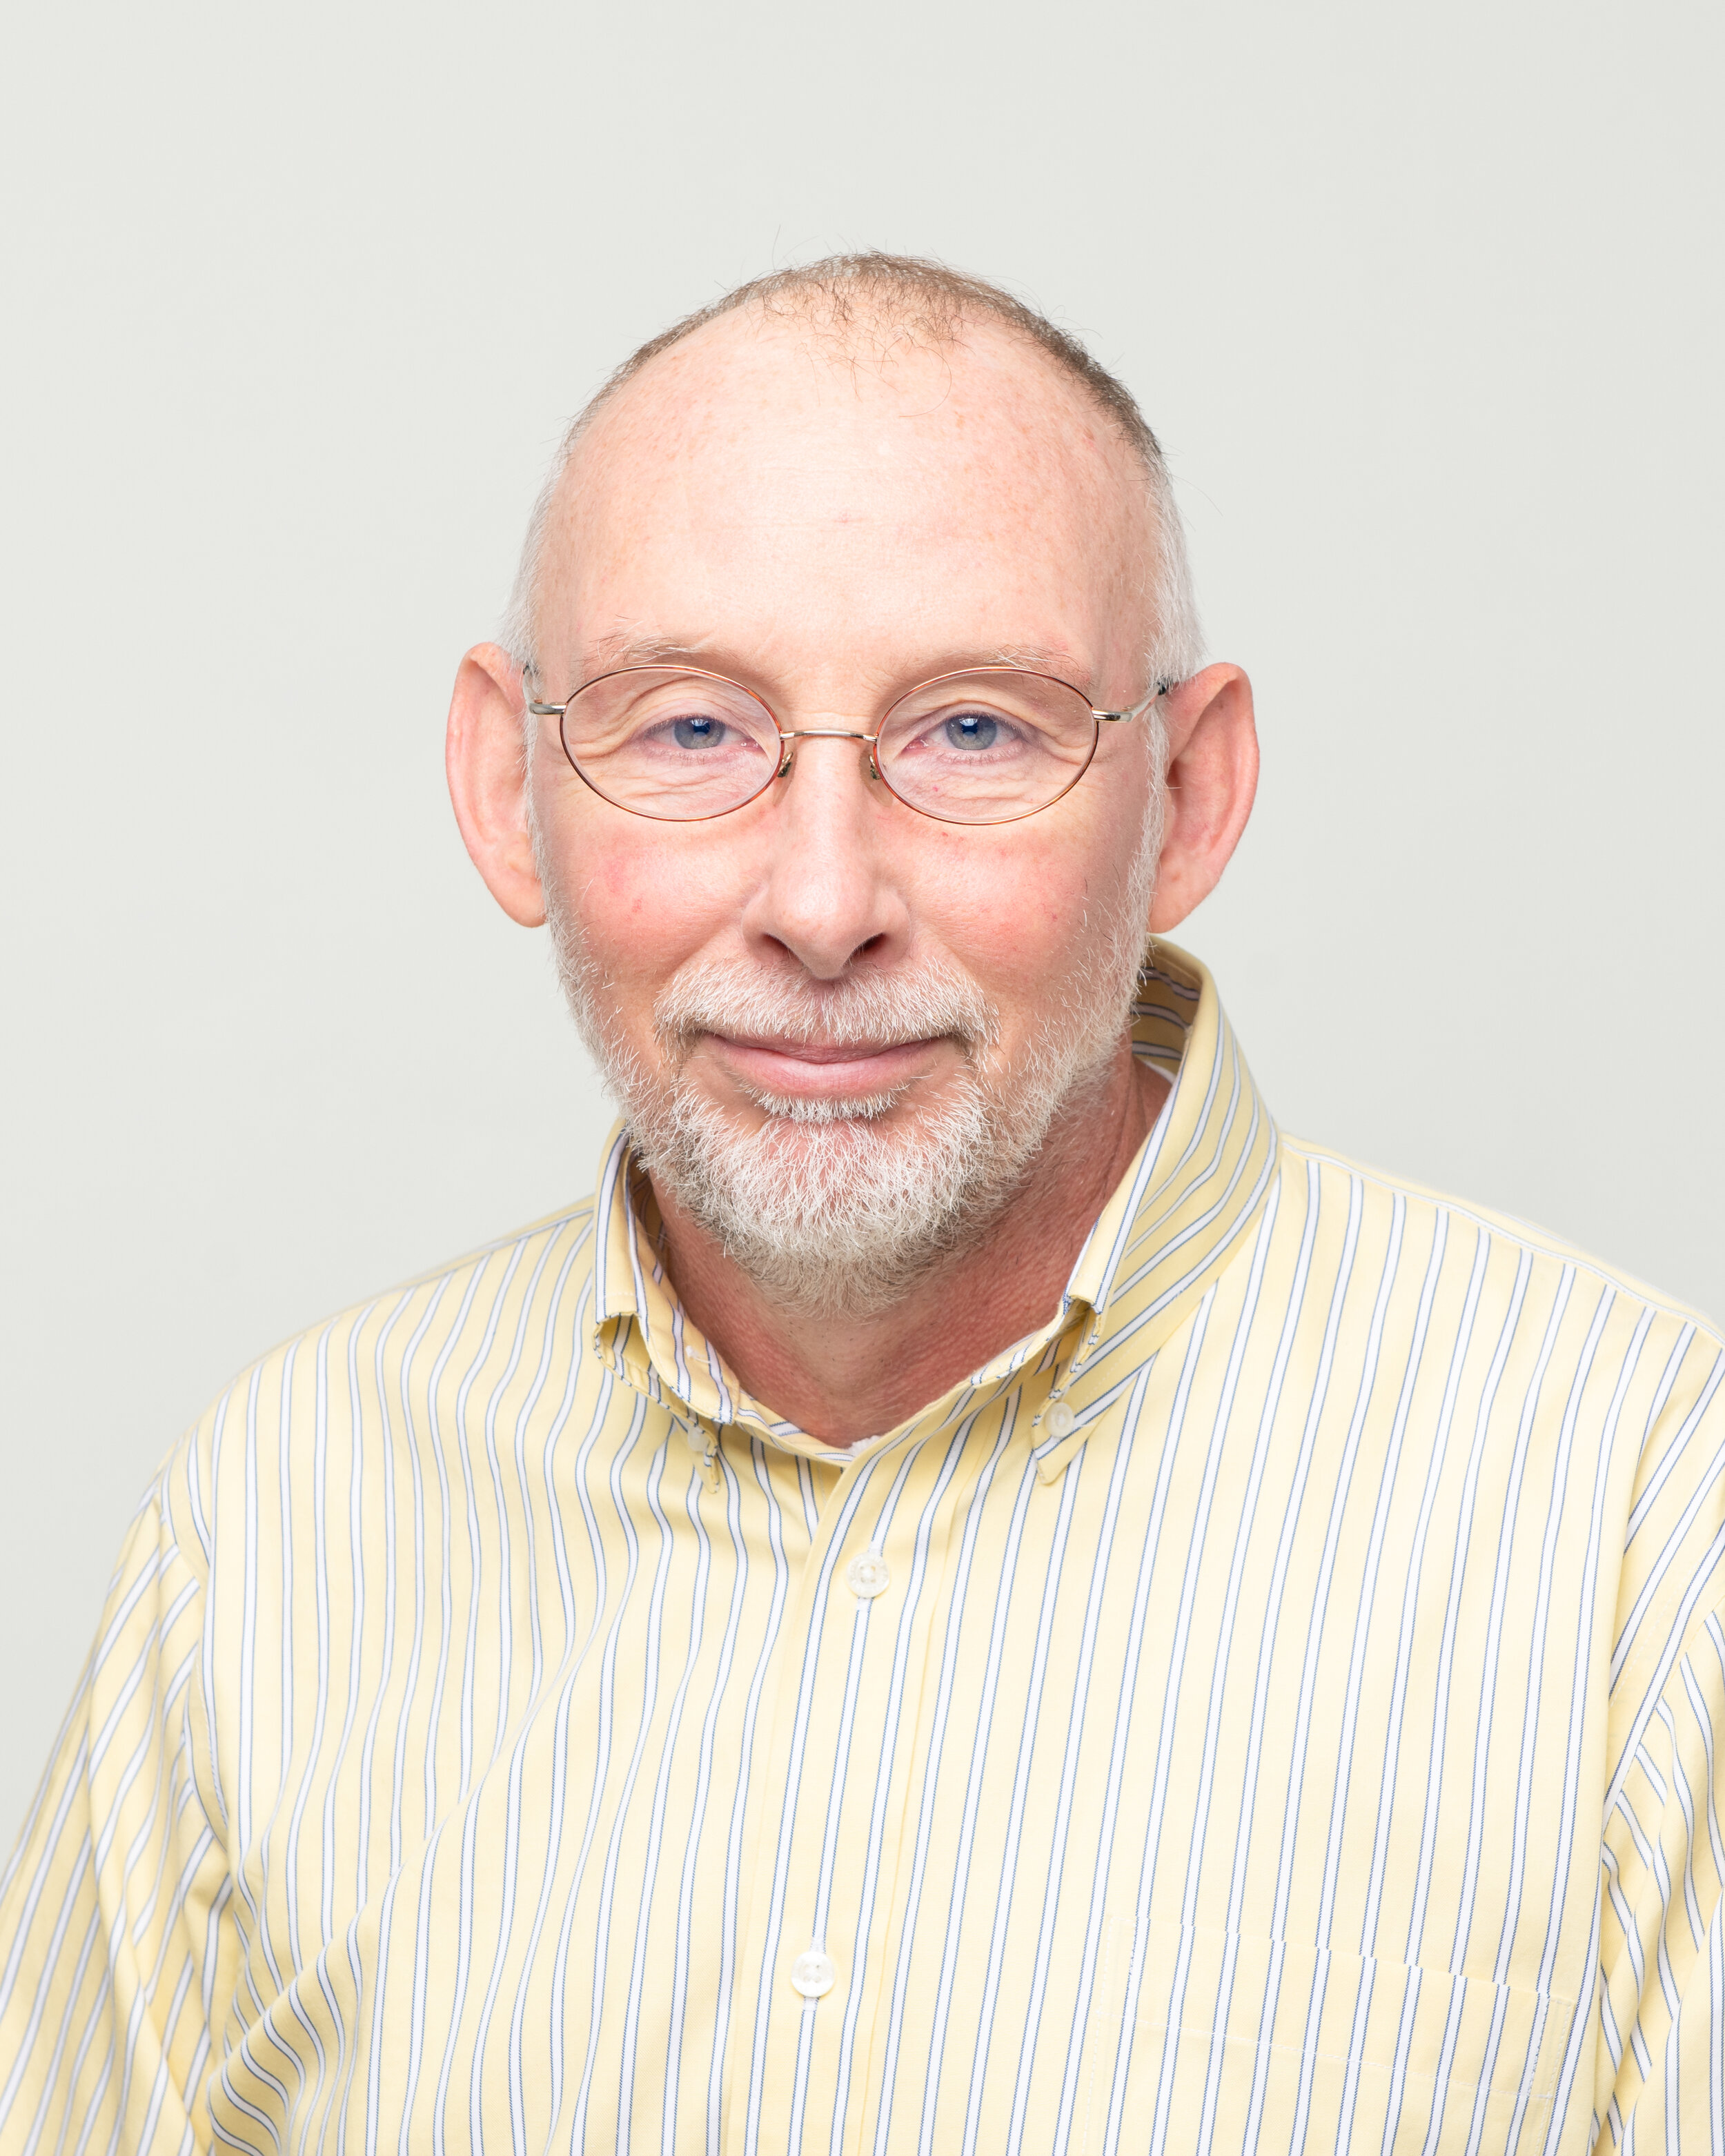 Dr. Scott McCullough